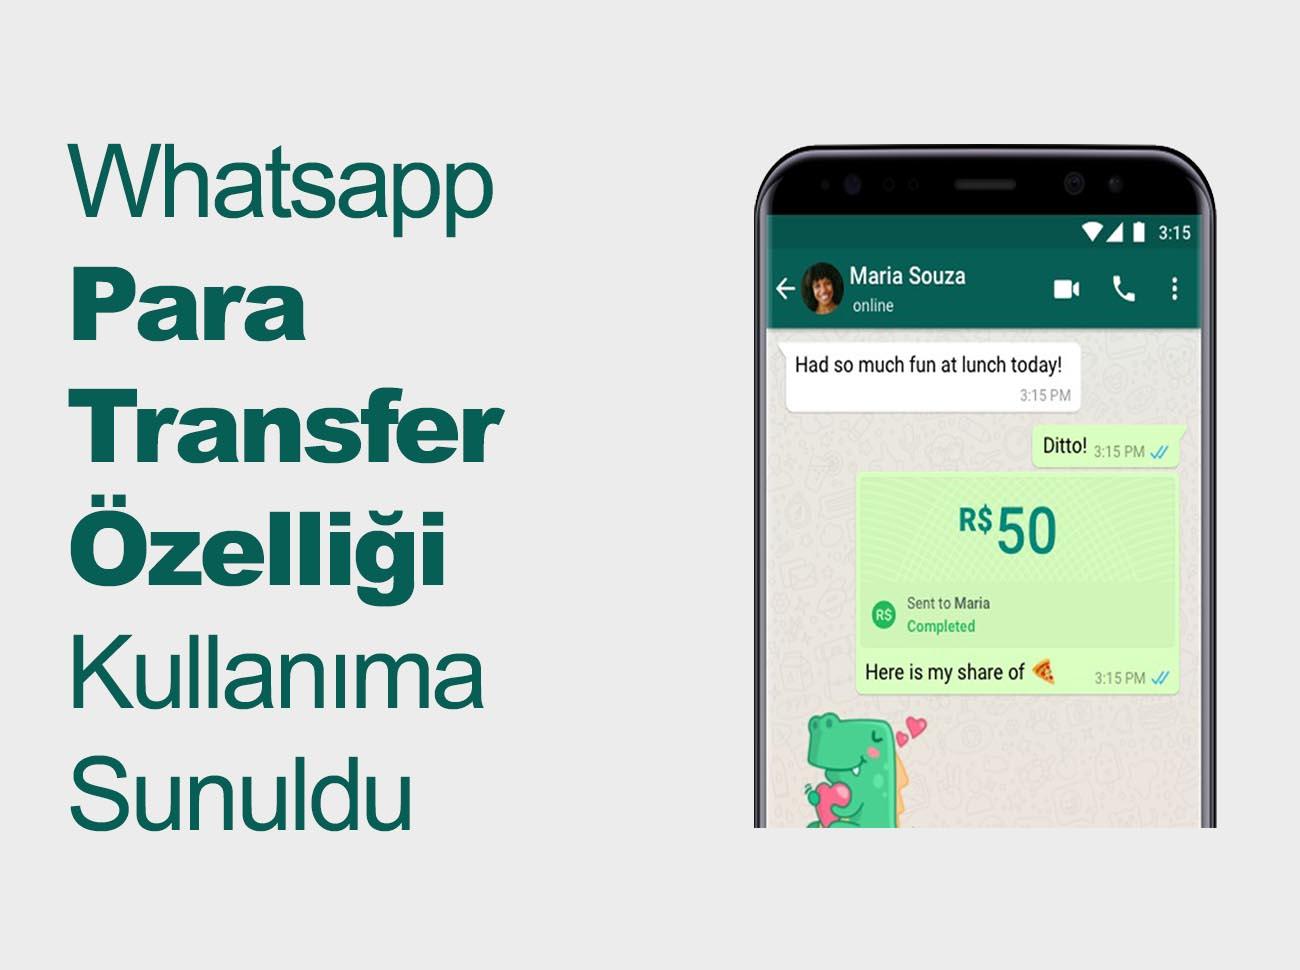 Whatsapp Para Transfer Özelliği